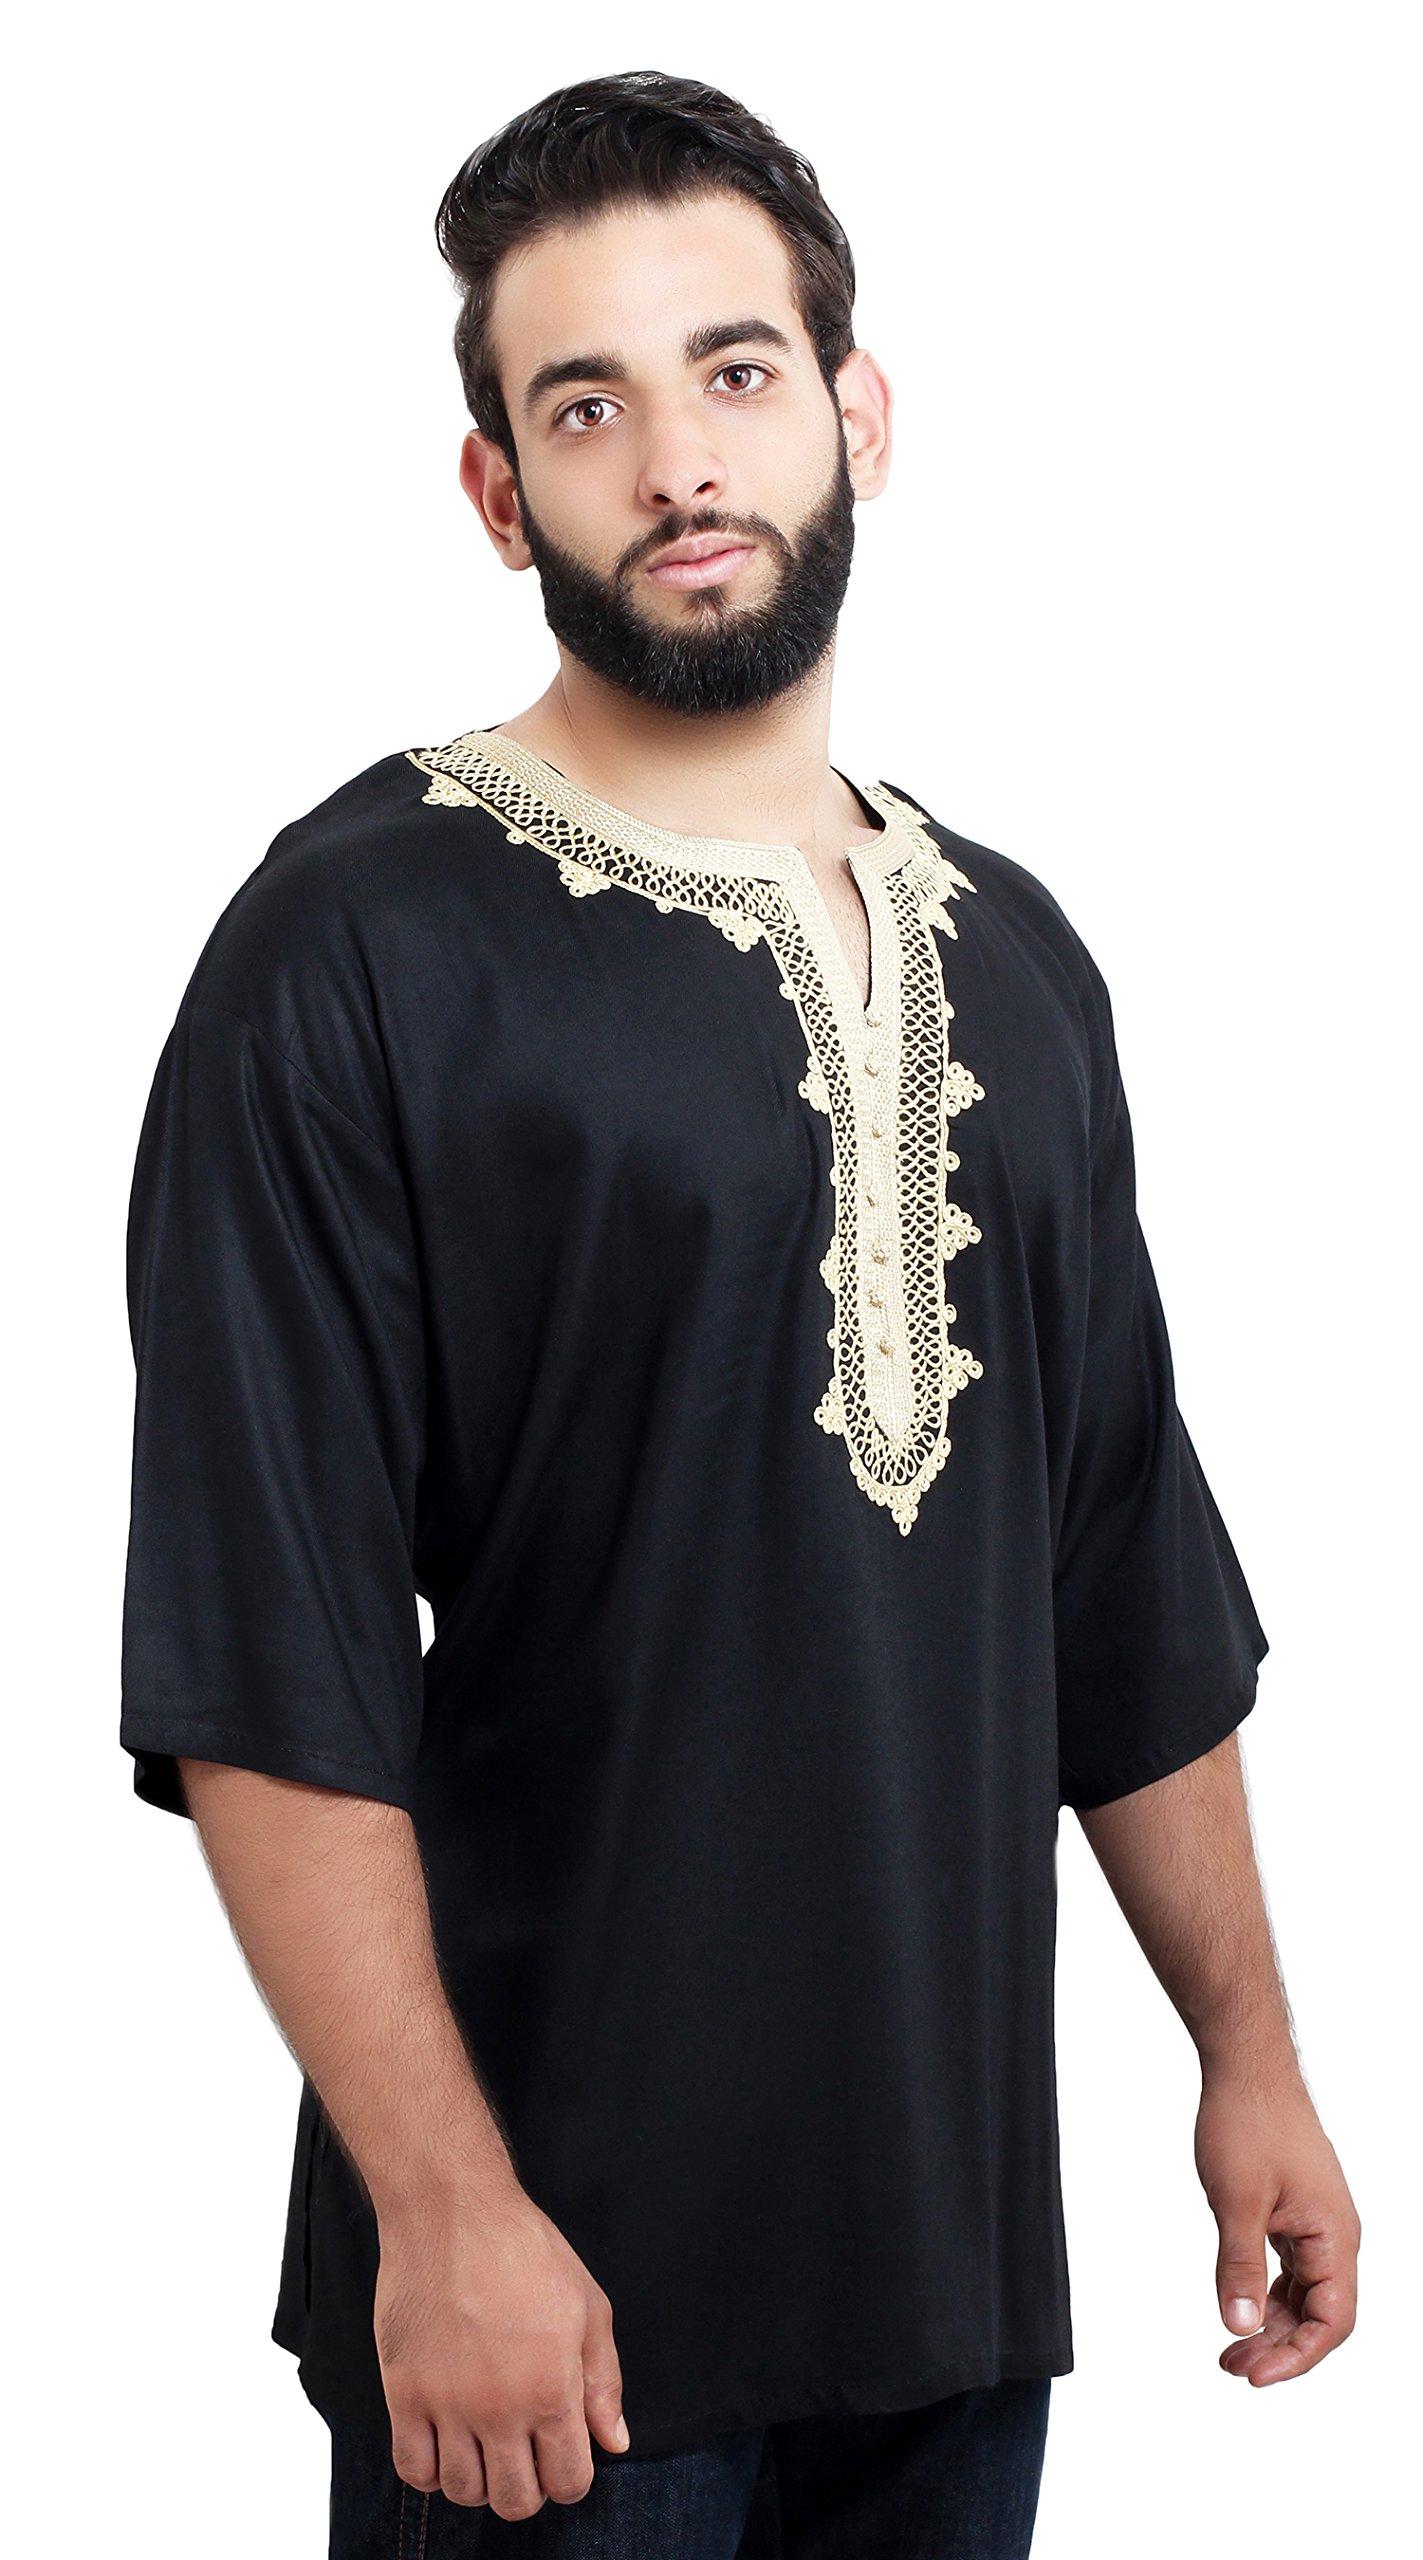 Moroccan Men Tunic Caftan Breathable Fiber Cotton Handmade Embroidery Ethnic Black